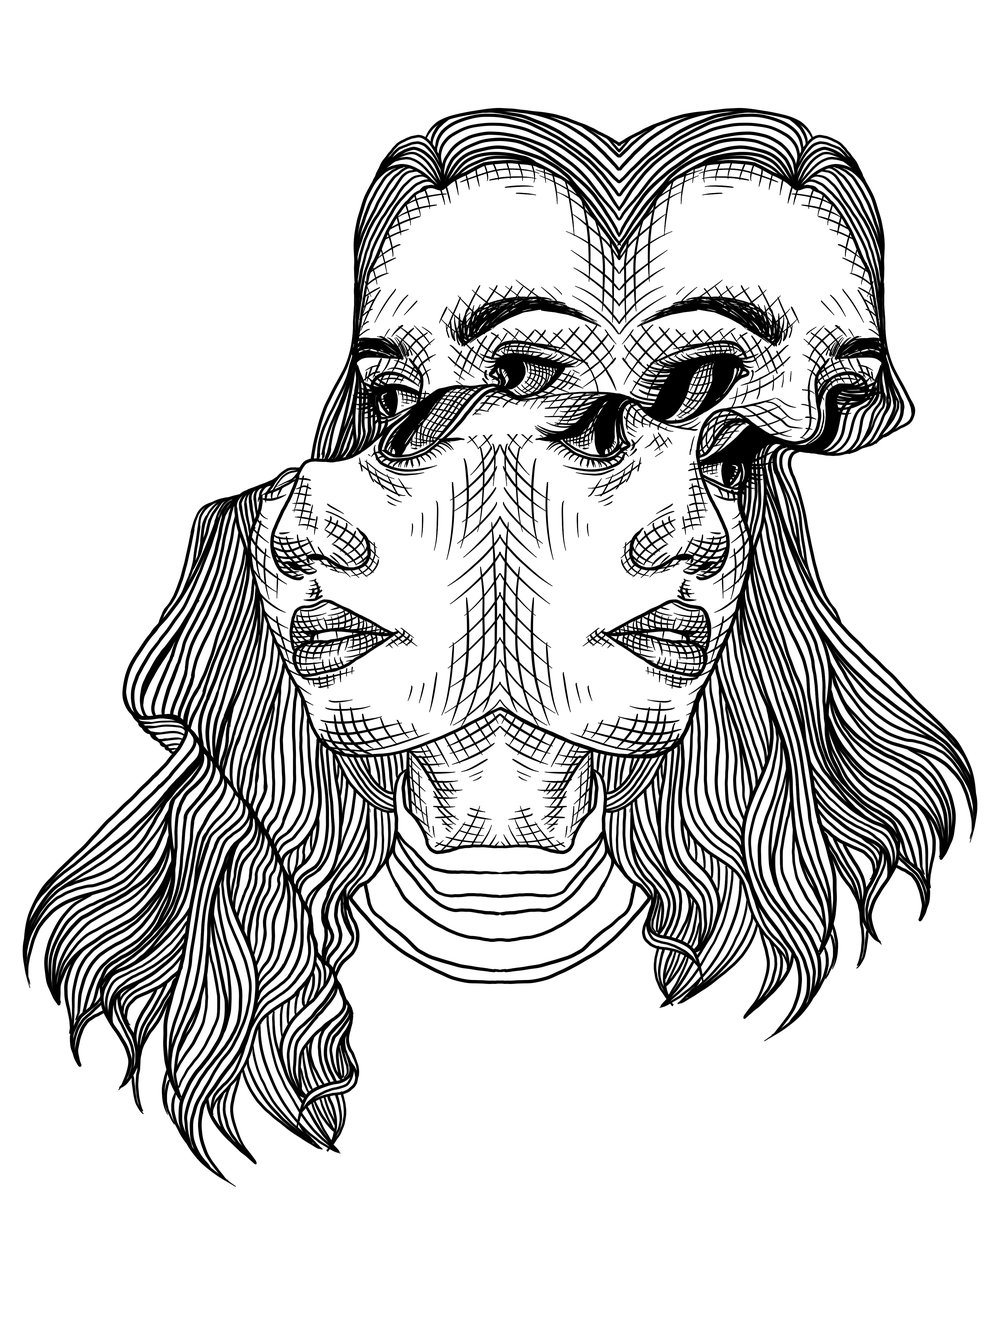 Untitled_Artwork-229.jpg